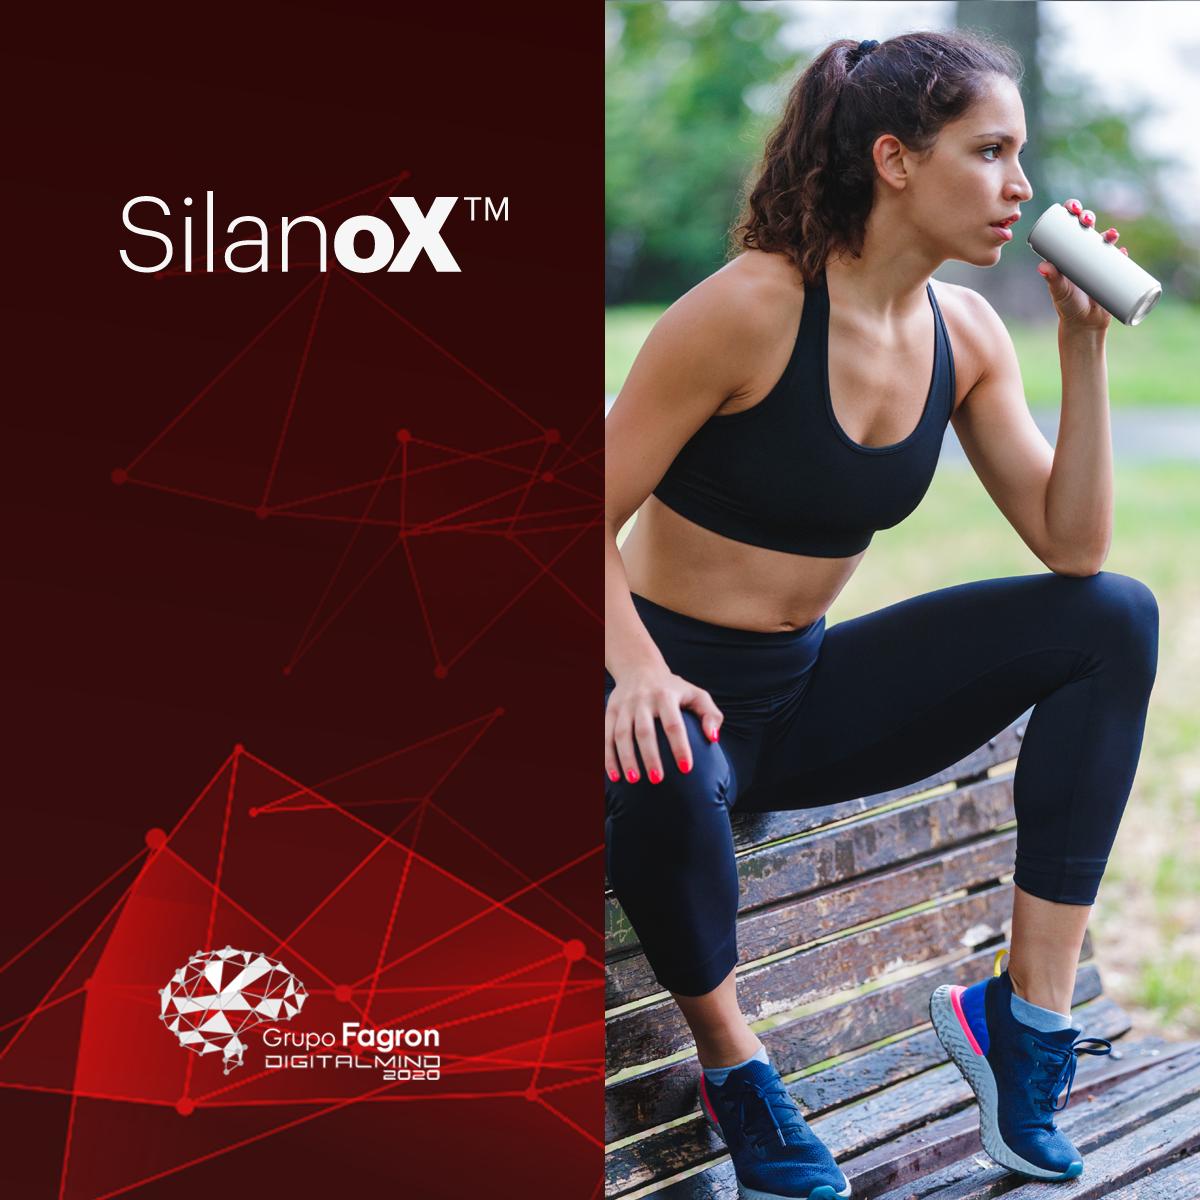 Silanox DigitalMind 2020